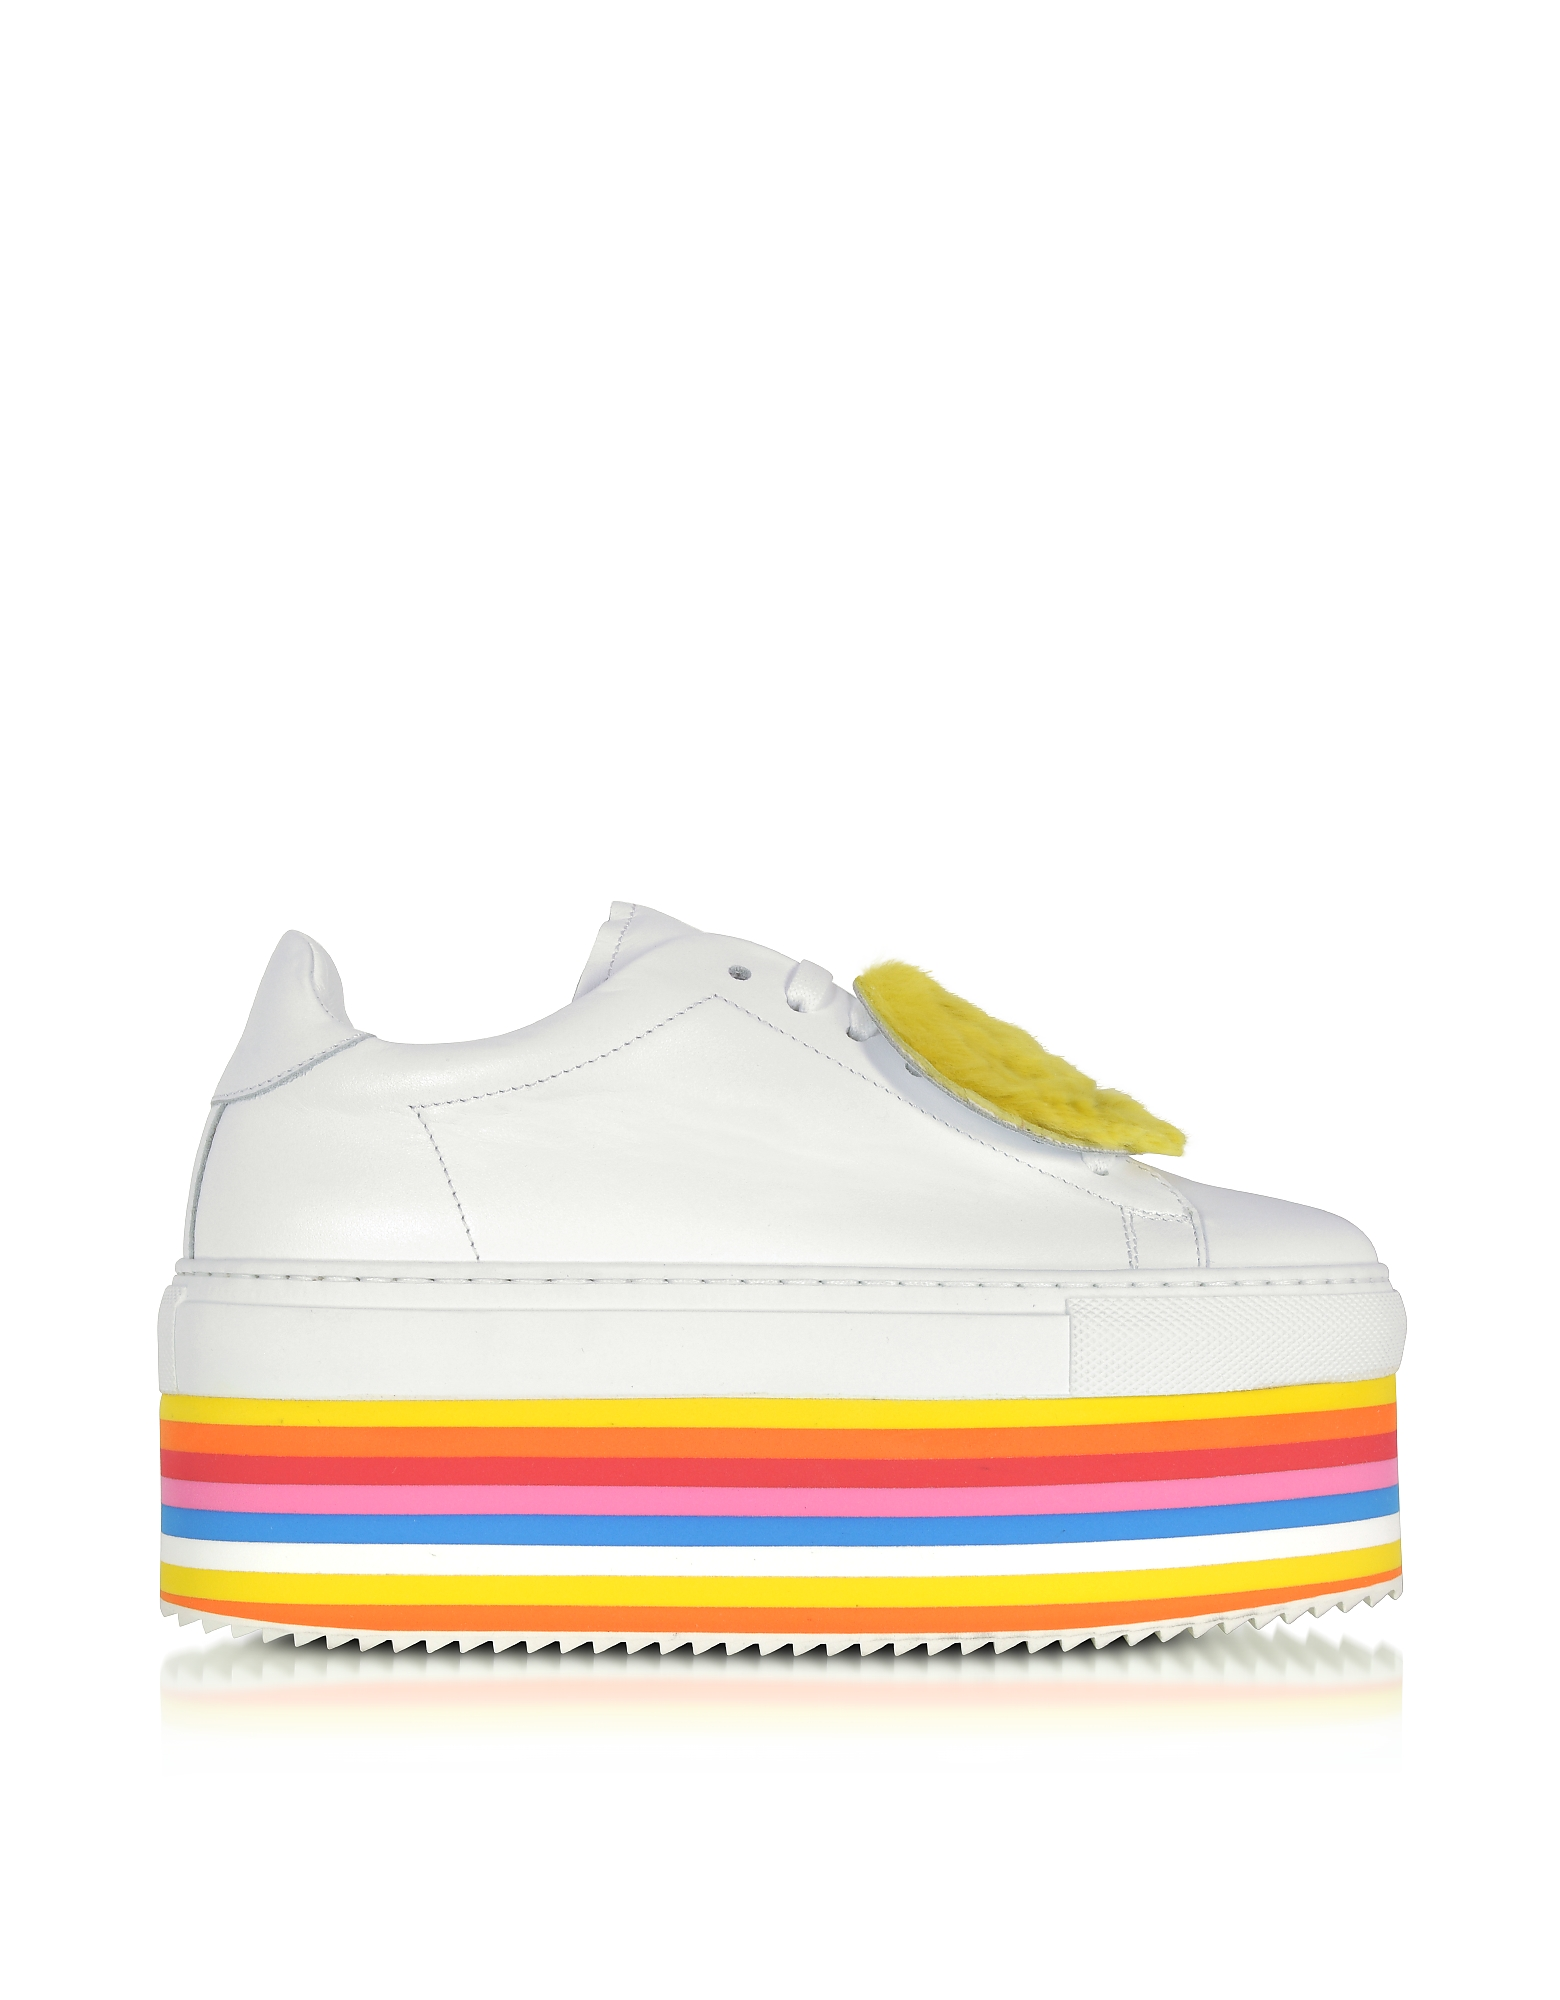 Joshua Sanders Shoes, White Leather Rainbow Flatform Smile Sneakers w/Socks